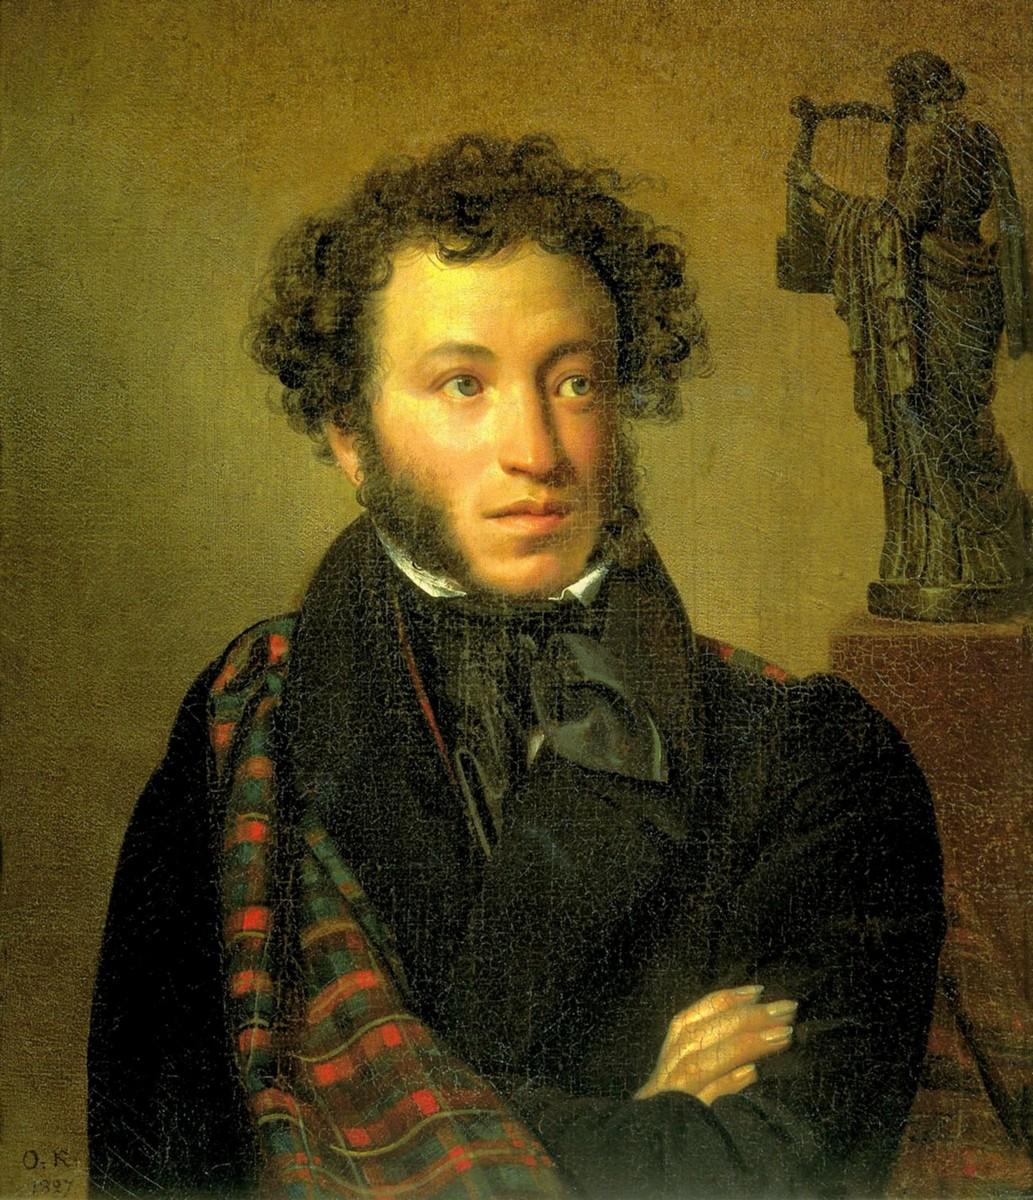 Орест Кипренский, 1827 год, картина «Портрет Пушкина».